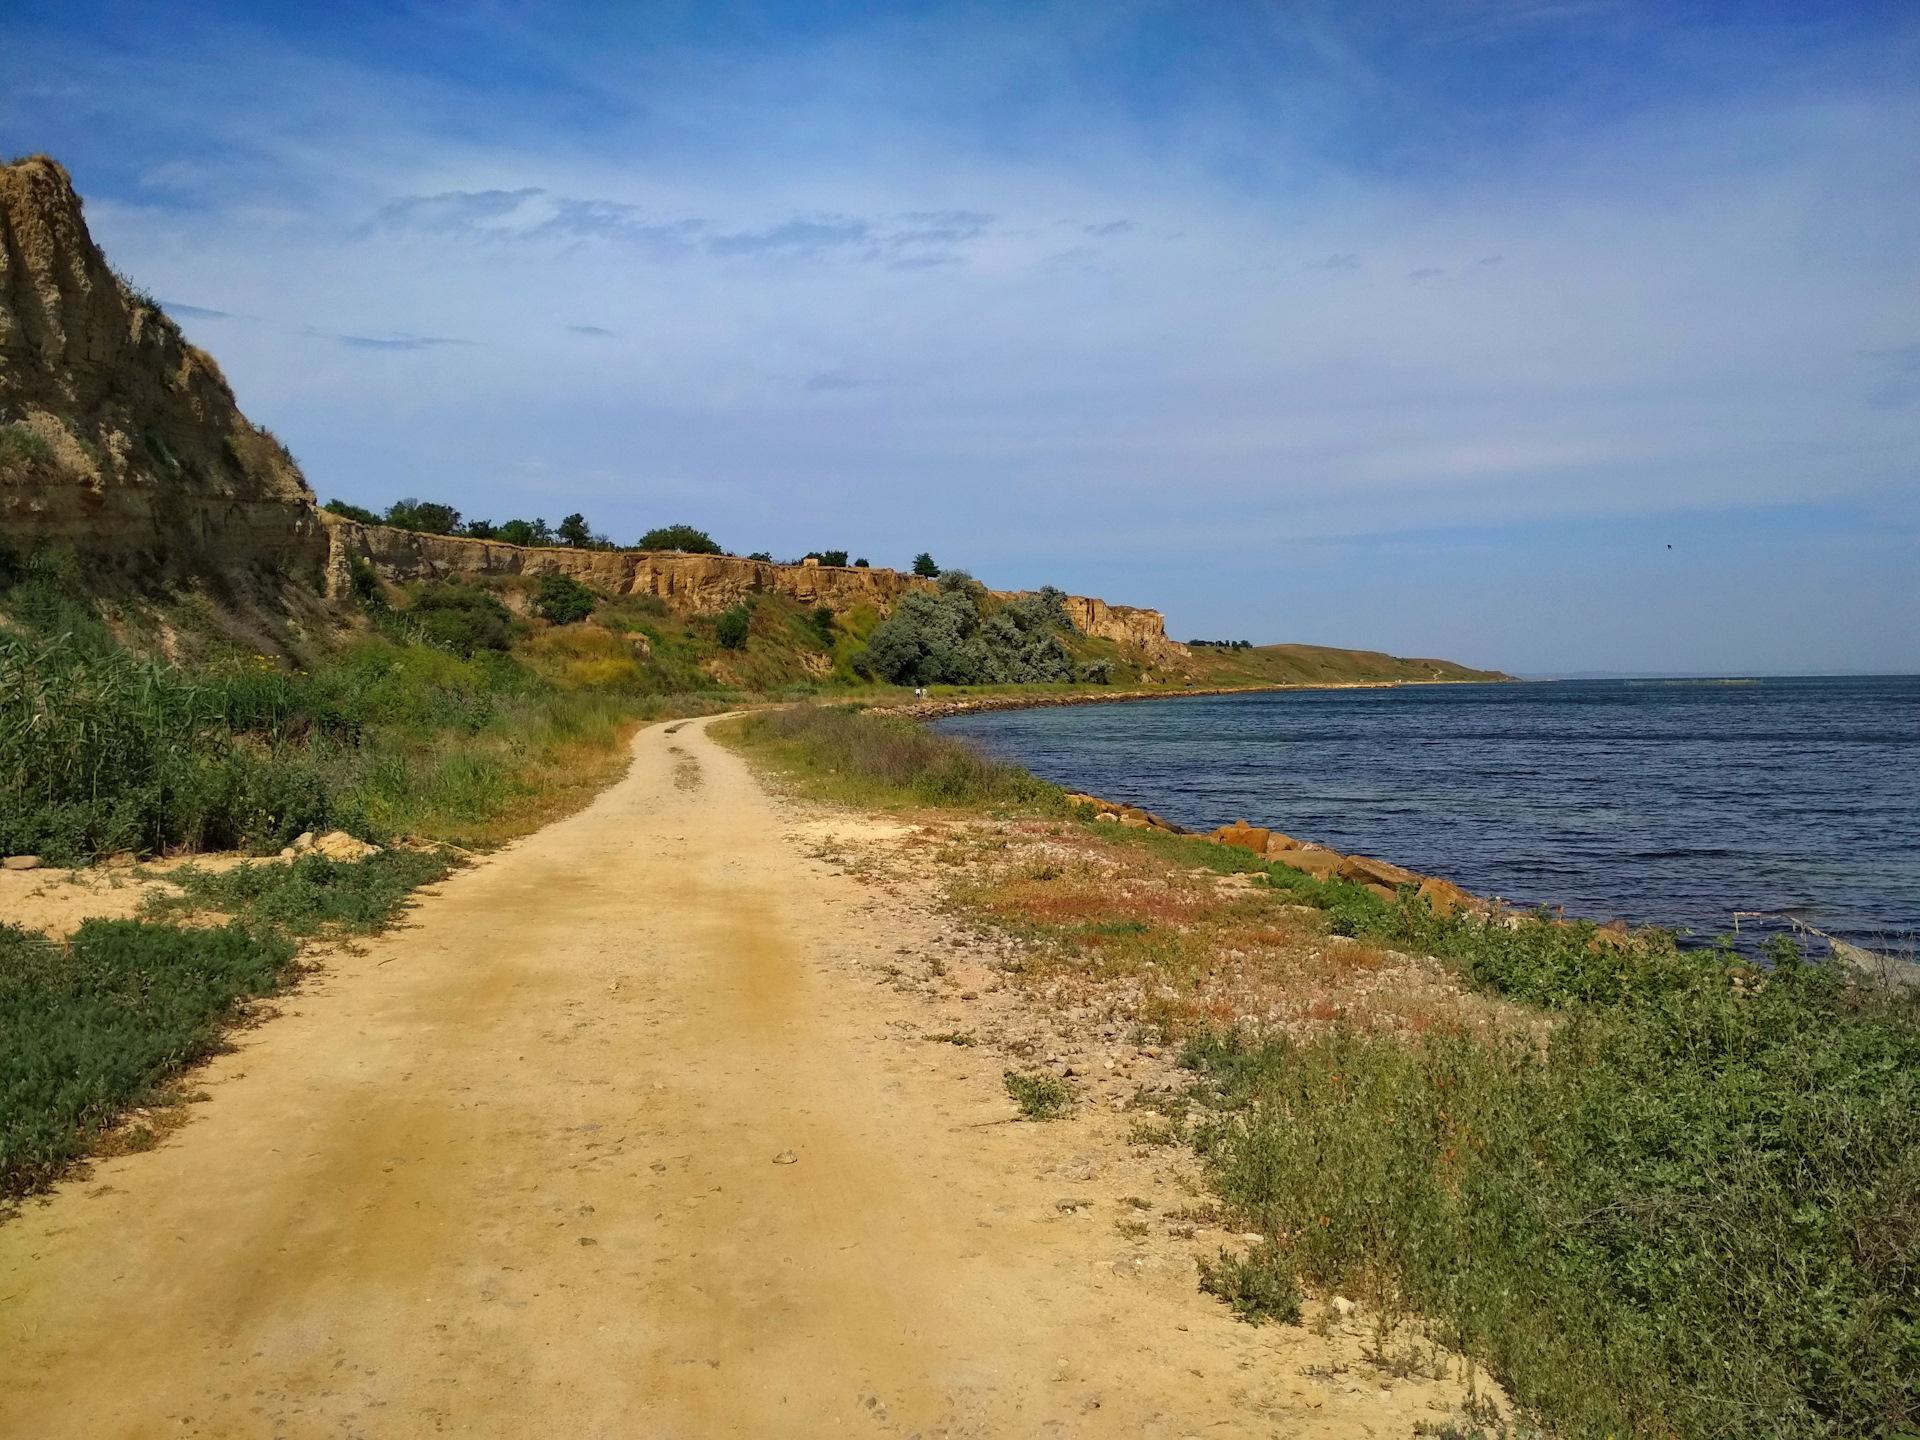 тамань краснодарский край фото города пляжа море стен фотографиями